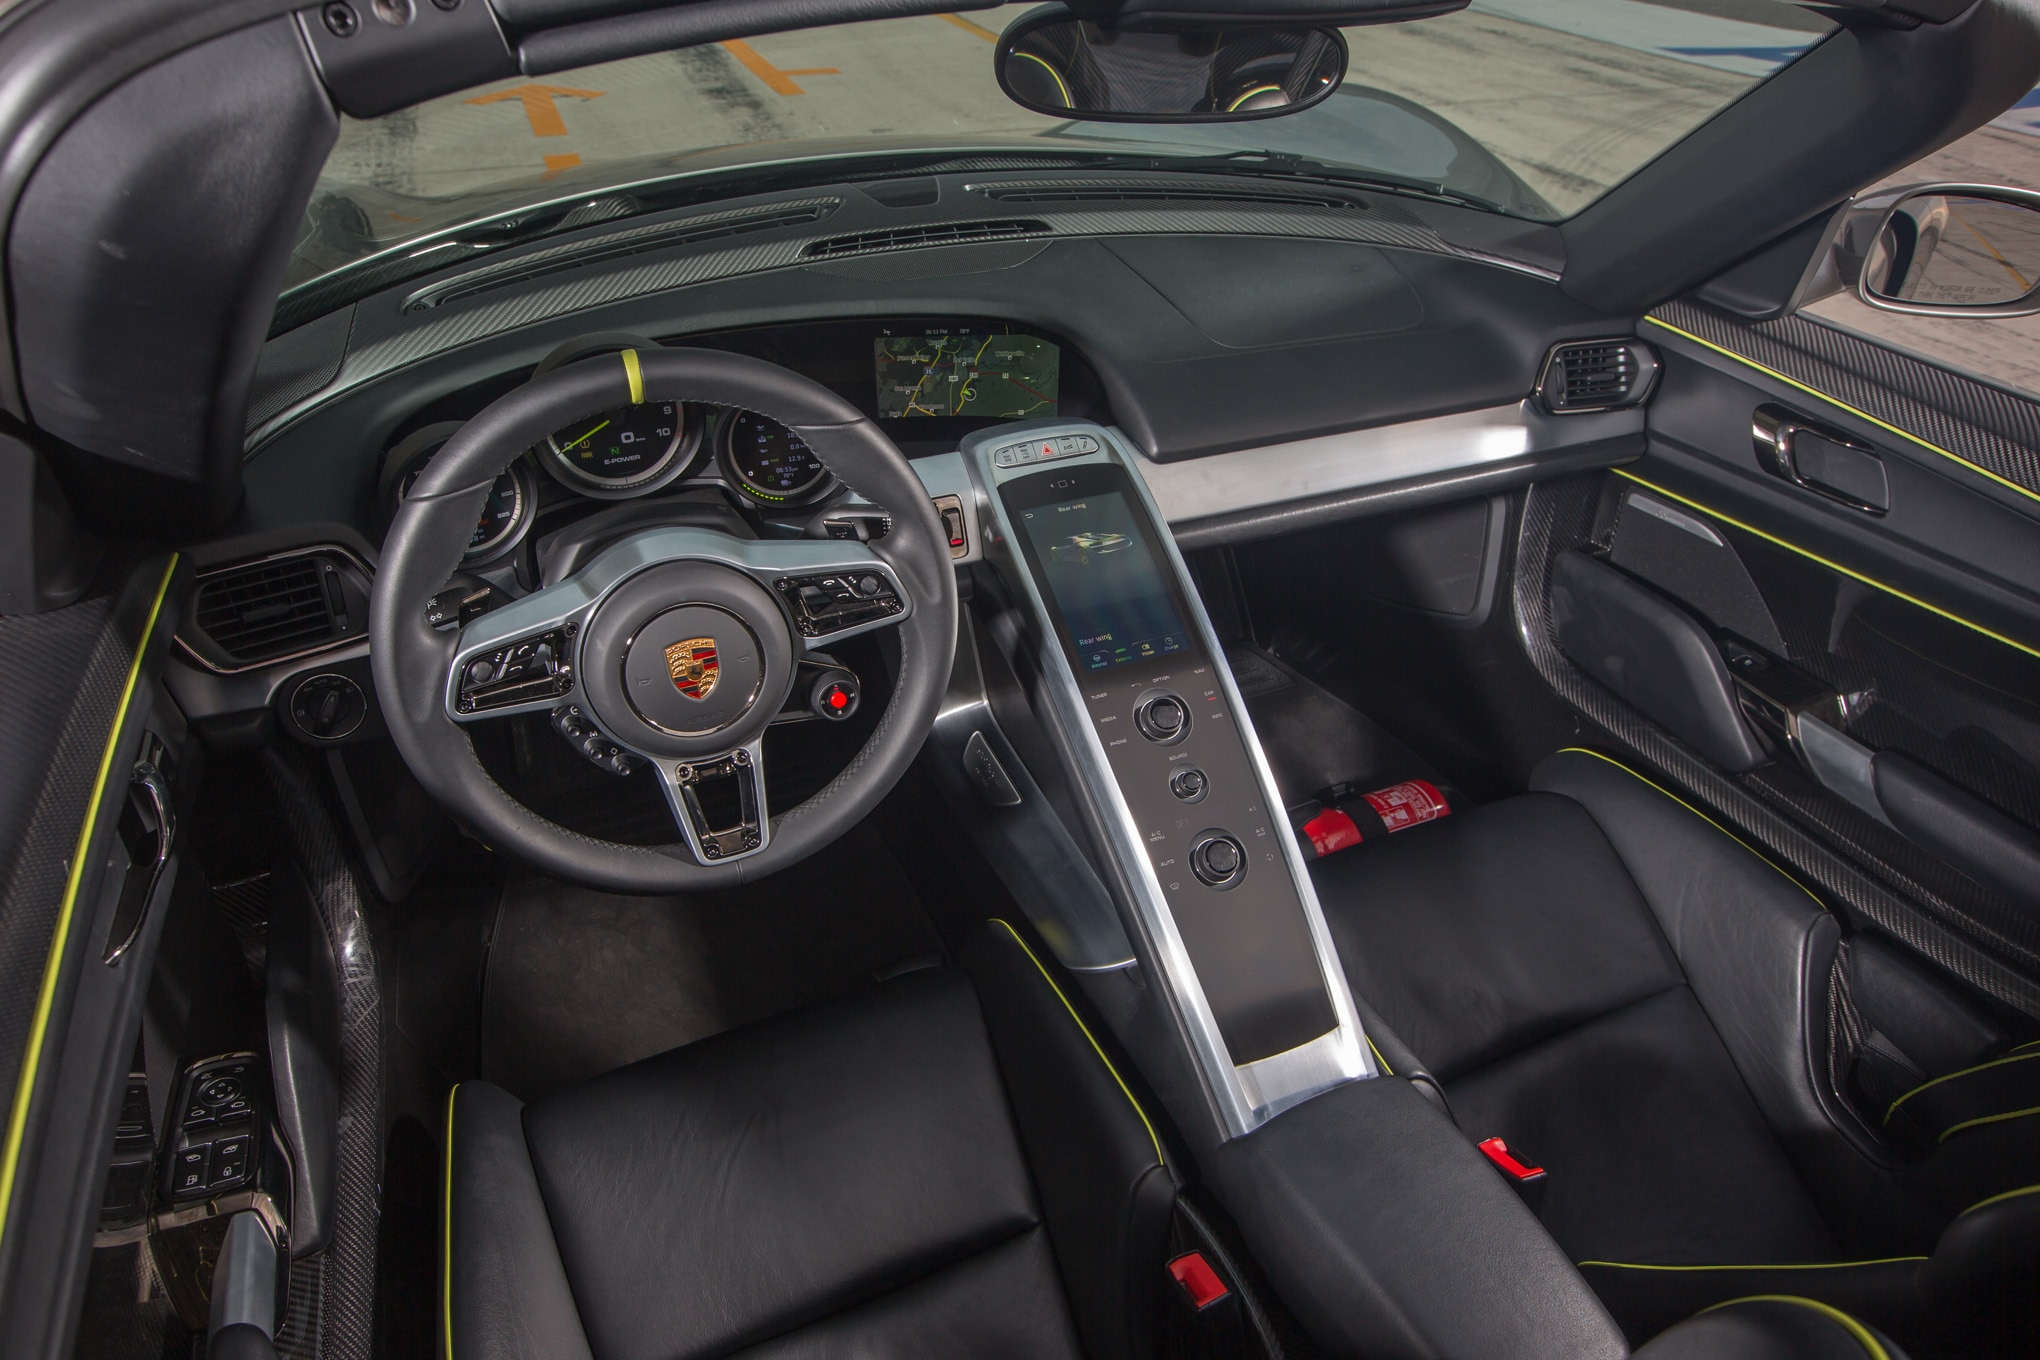 2015 porsche 918 spyder review automobile magazine - Porsche 918 interior ...